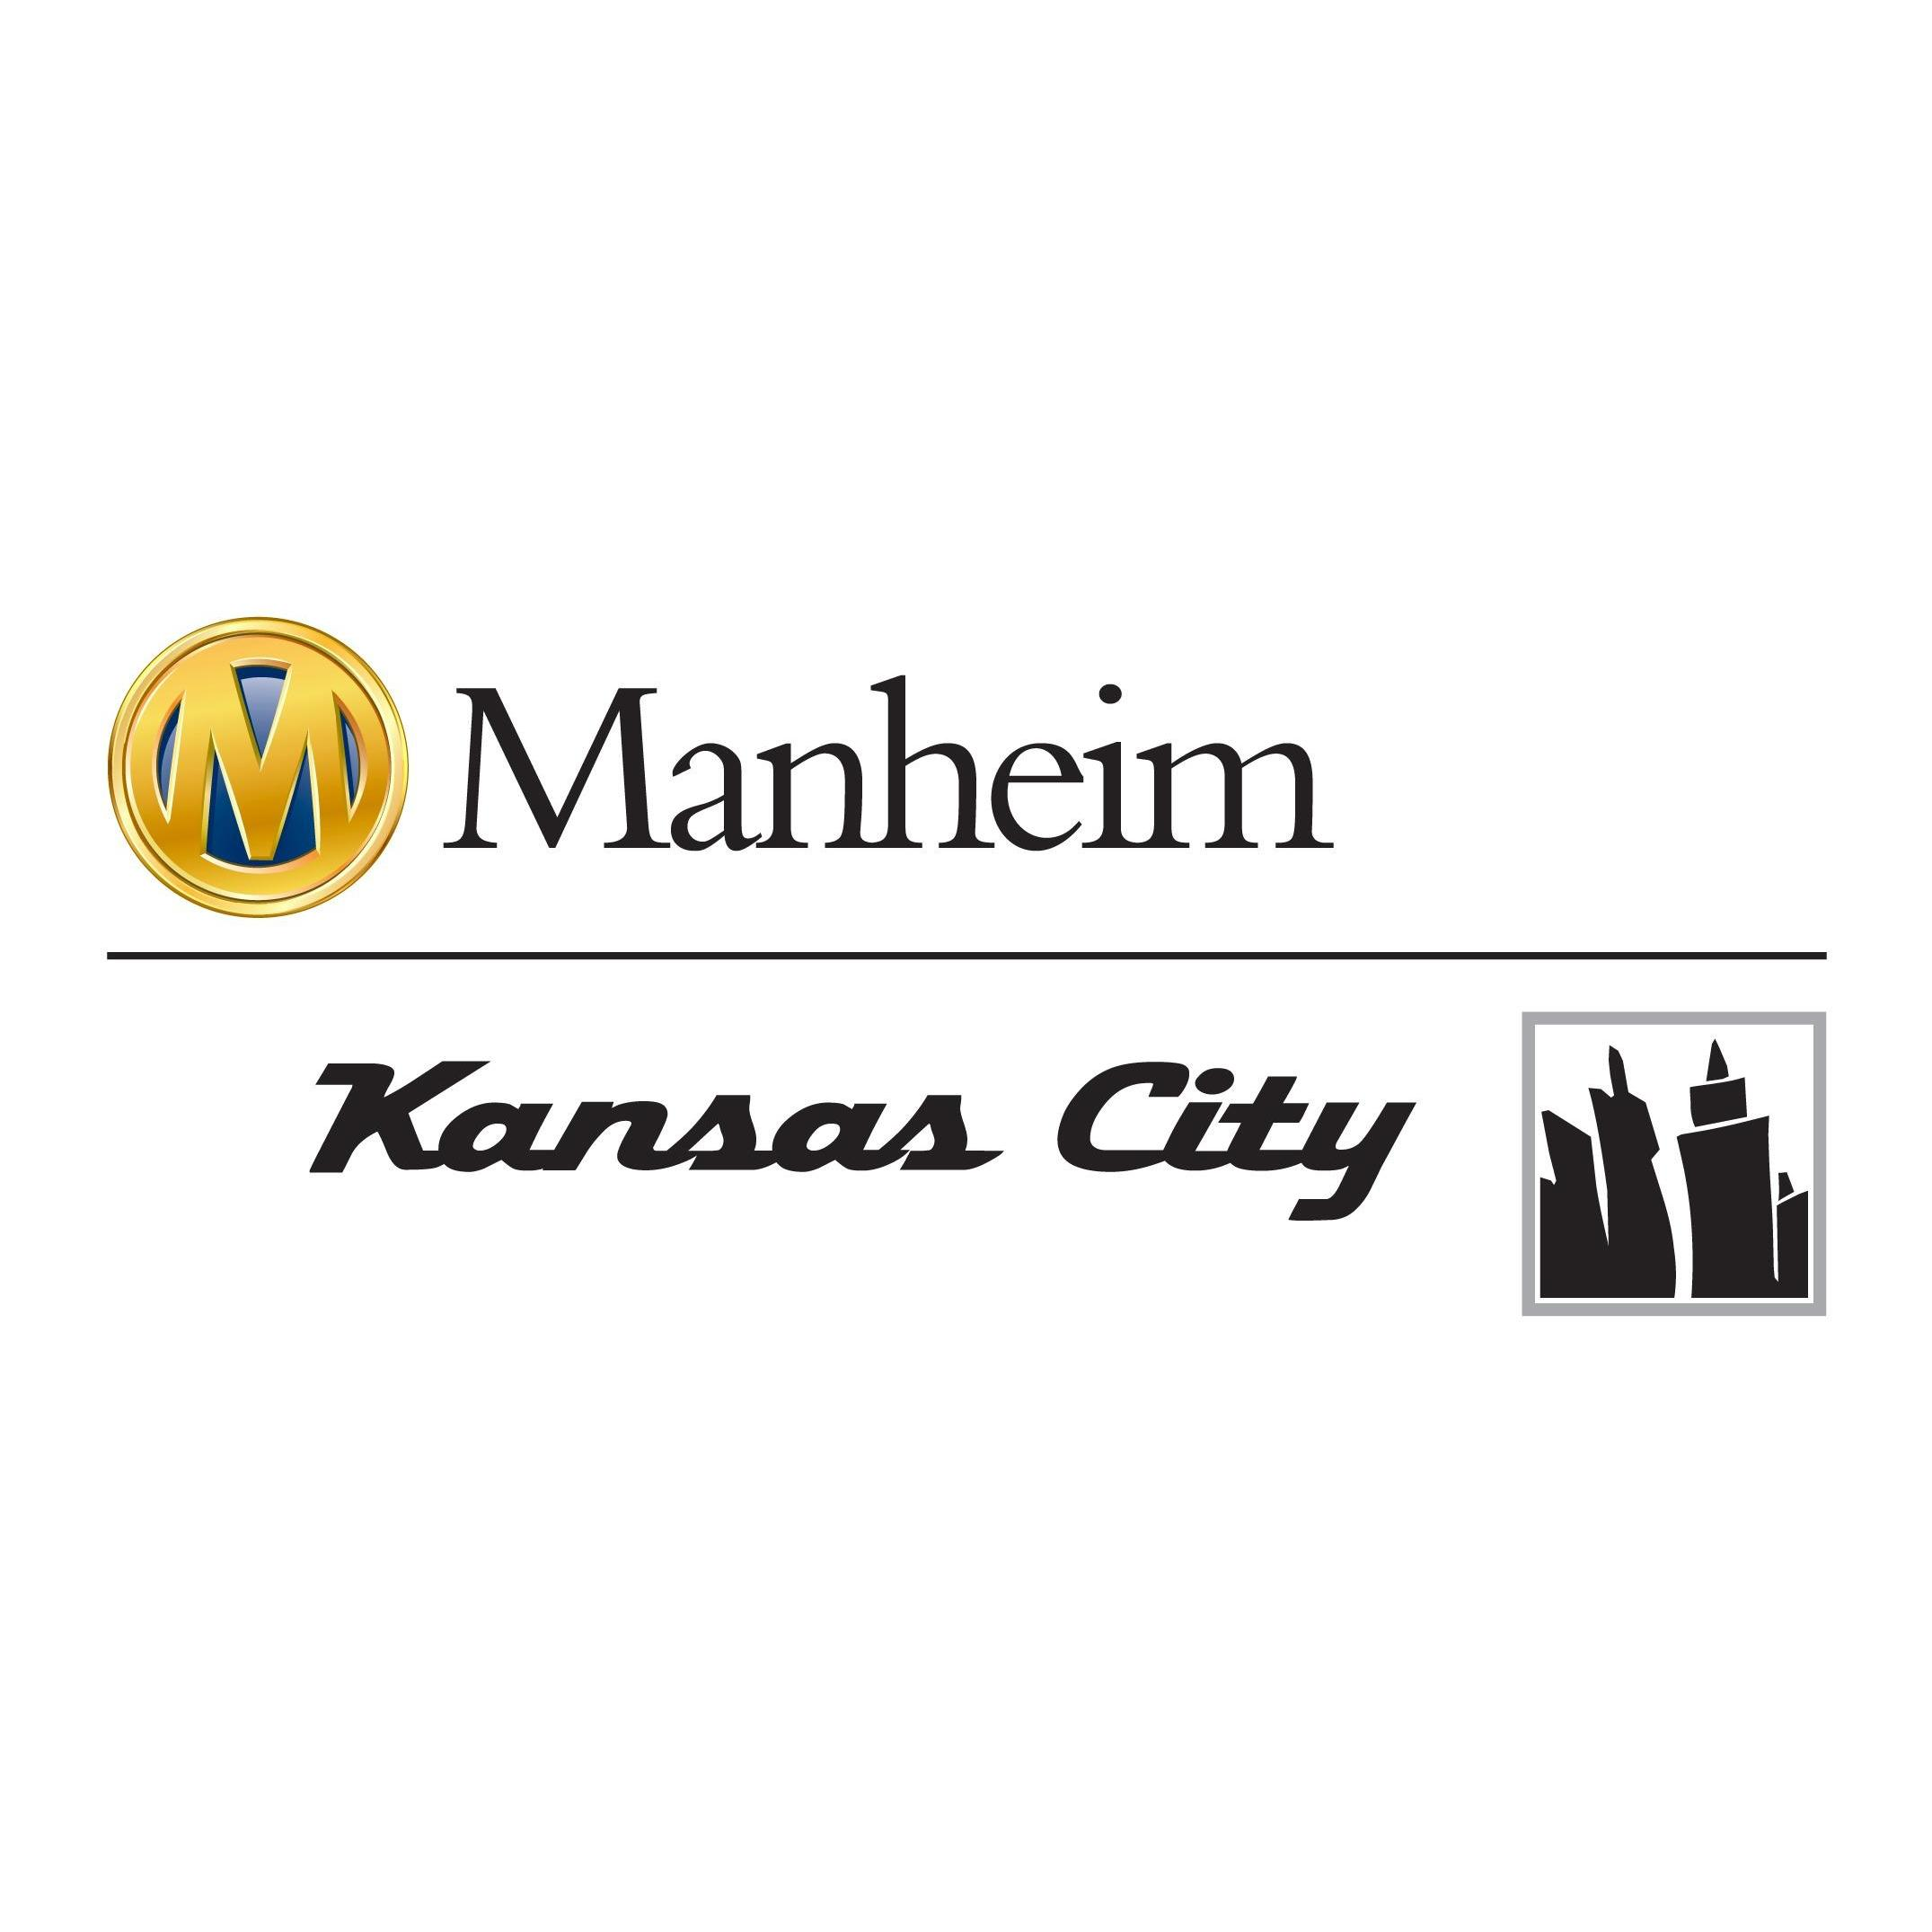 Manheim Kansas City